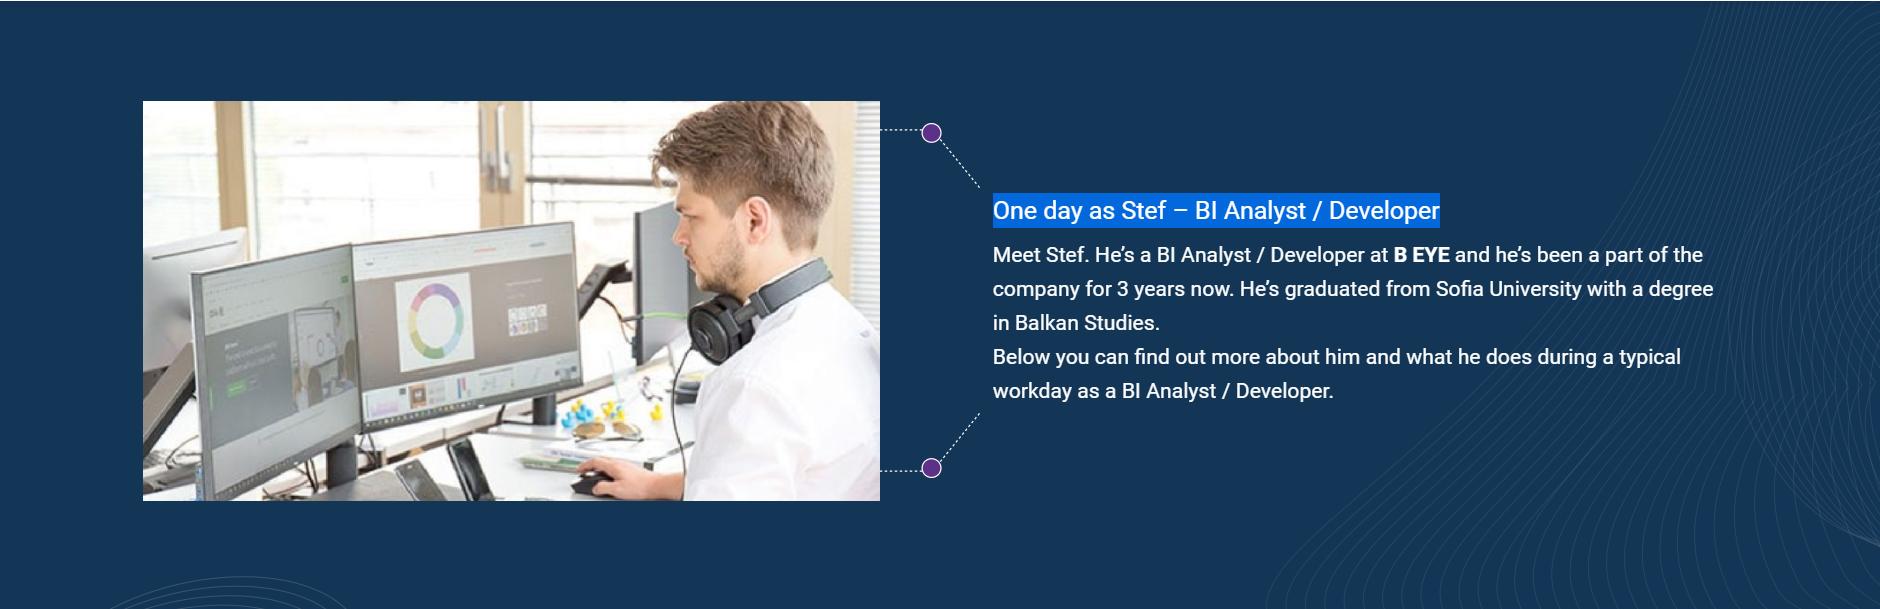 One day as Stef – BI Analyst / Developer